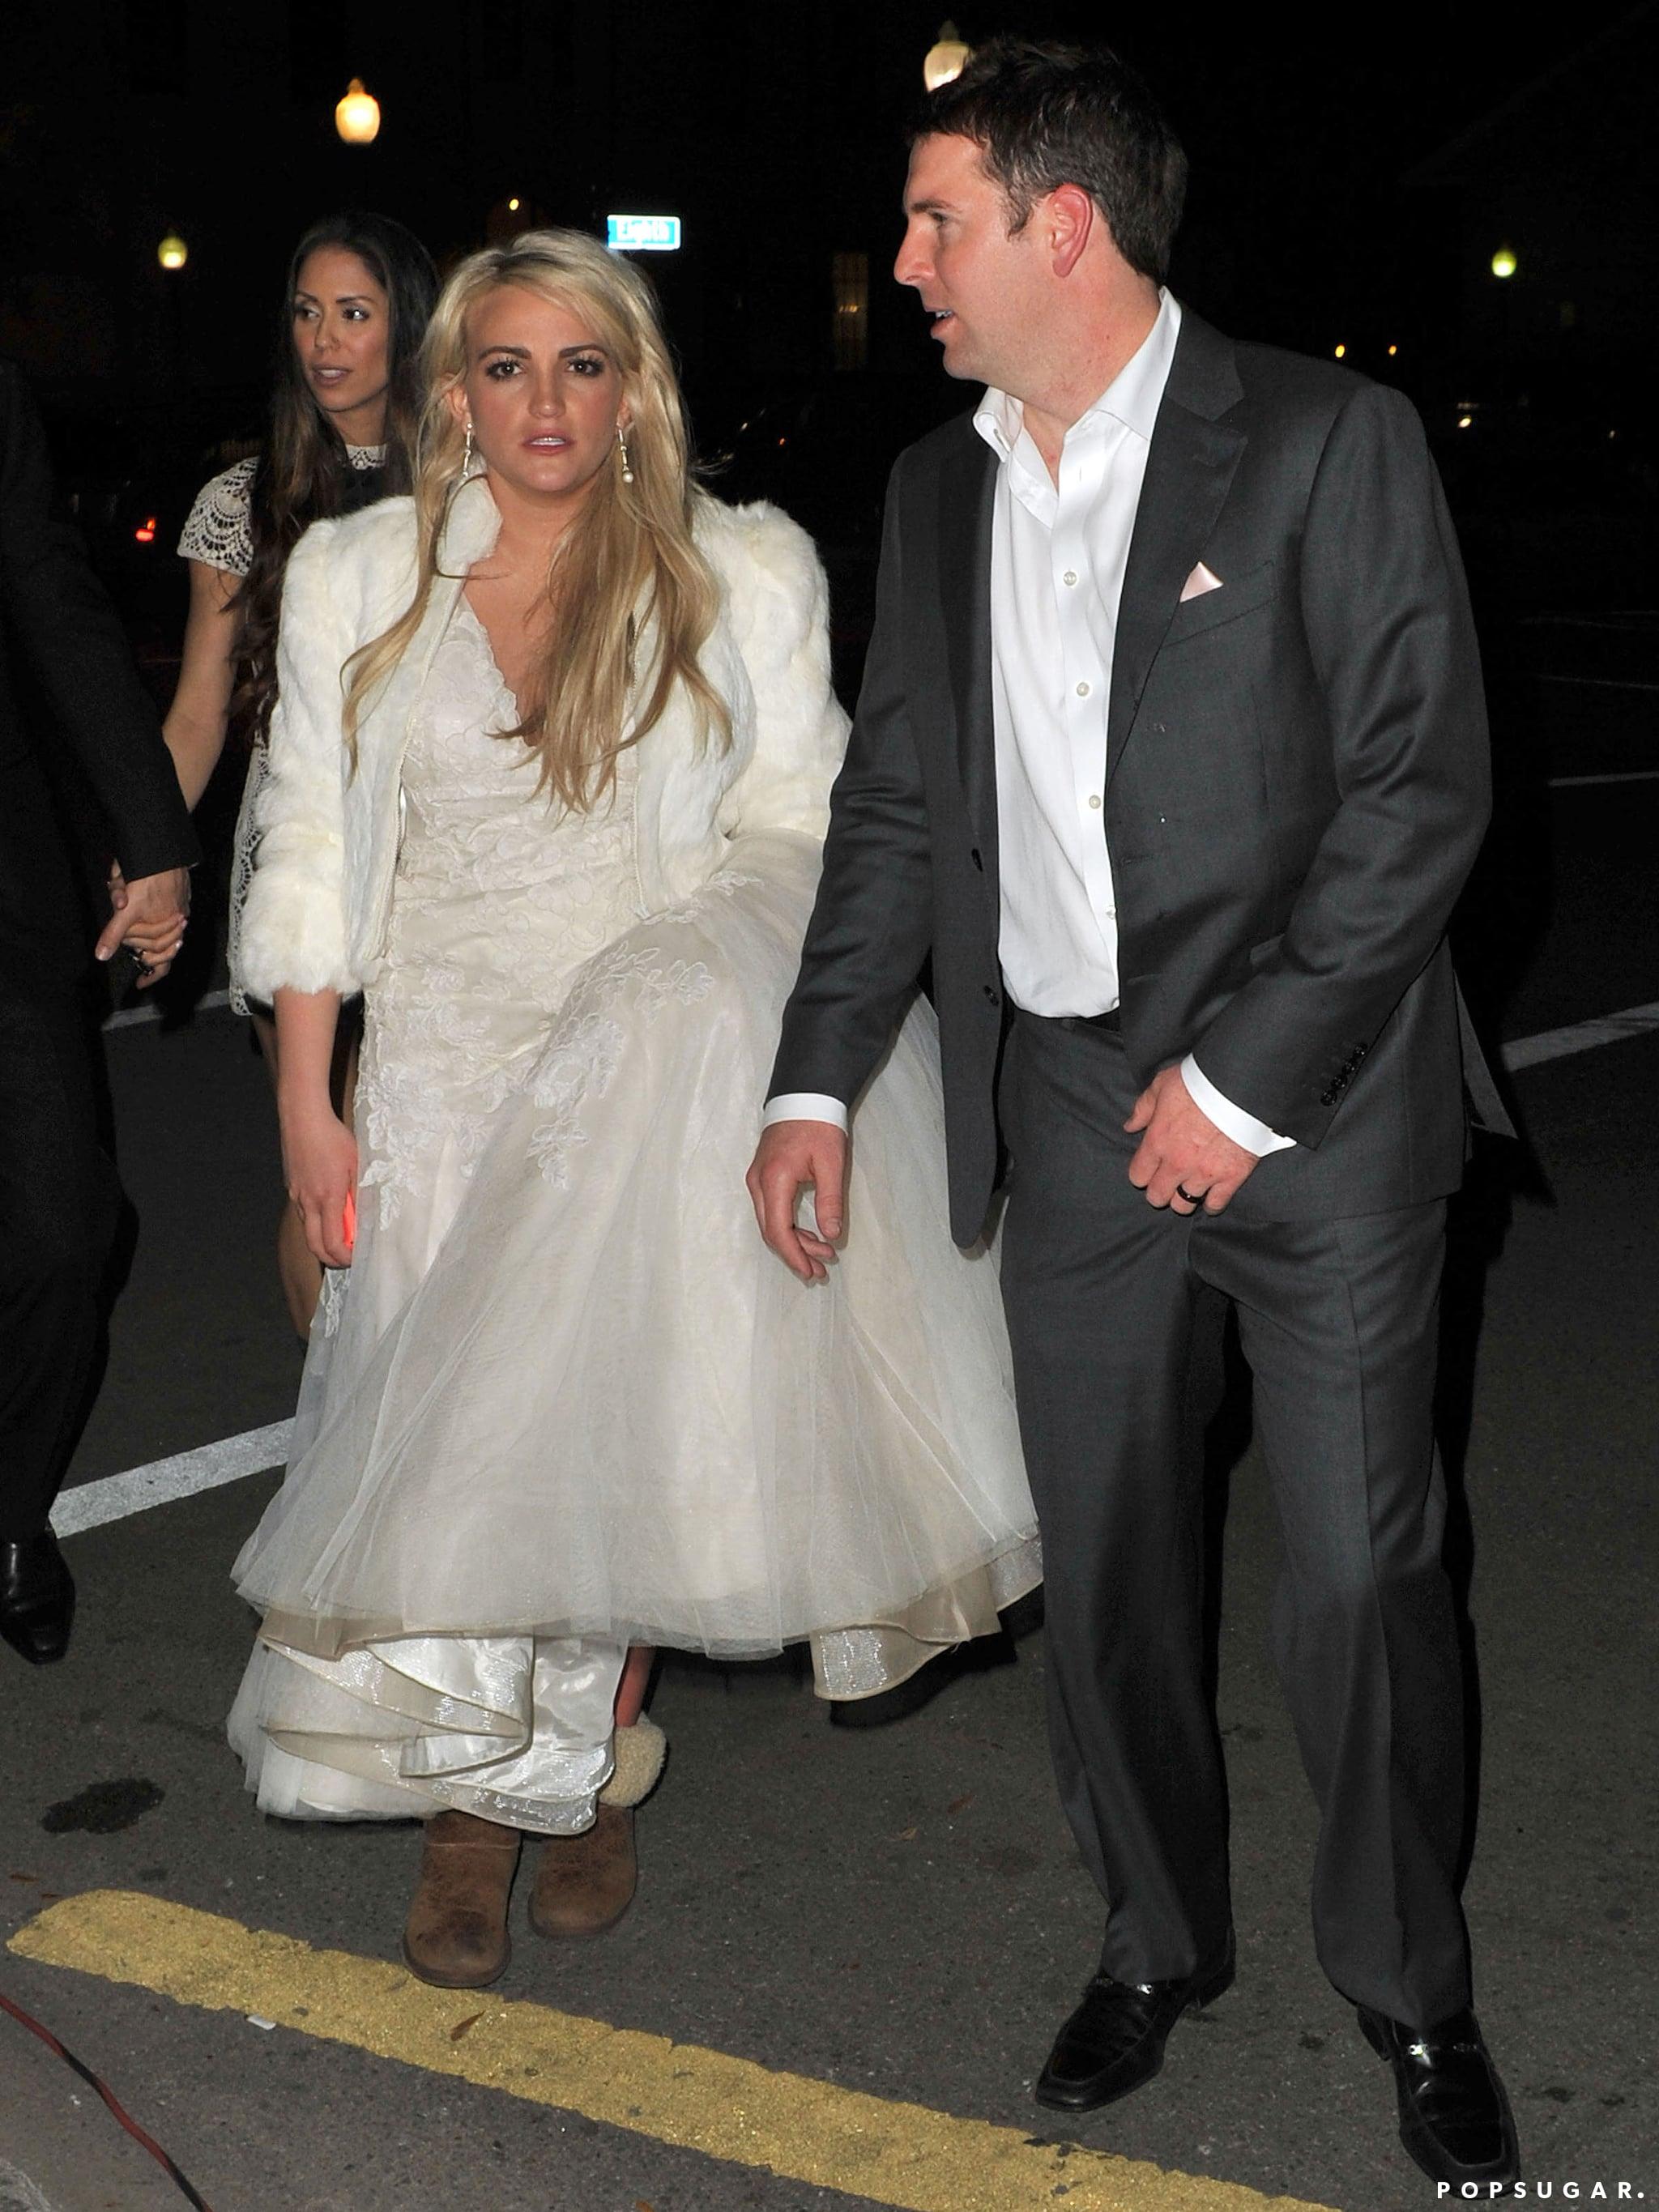 Like a True Spears Girl, Jamie Lynn Pairs Her Wedding Dress With Uggs